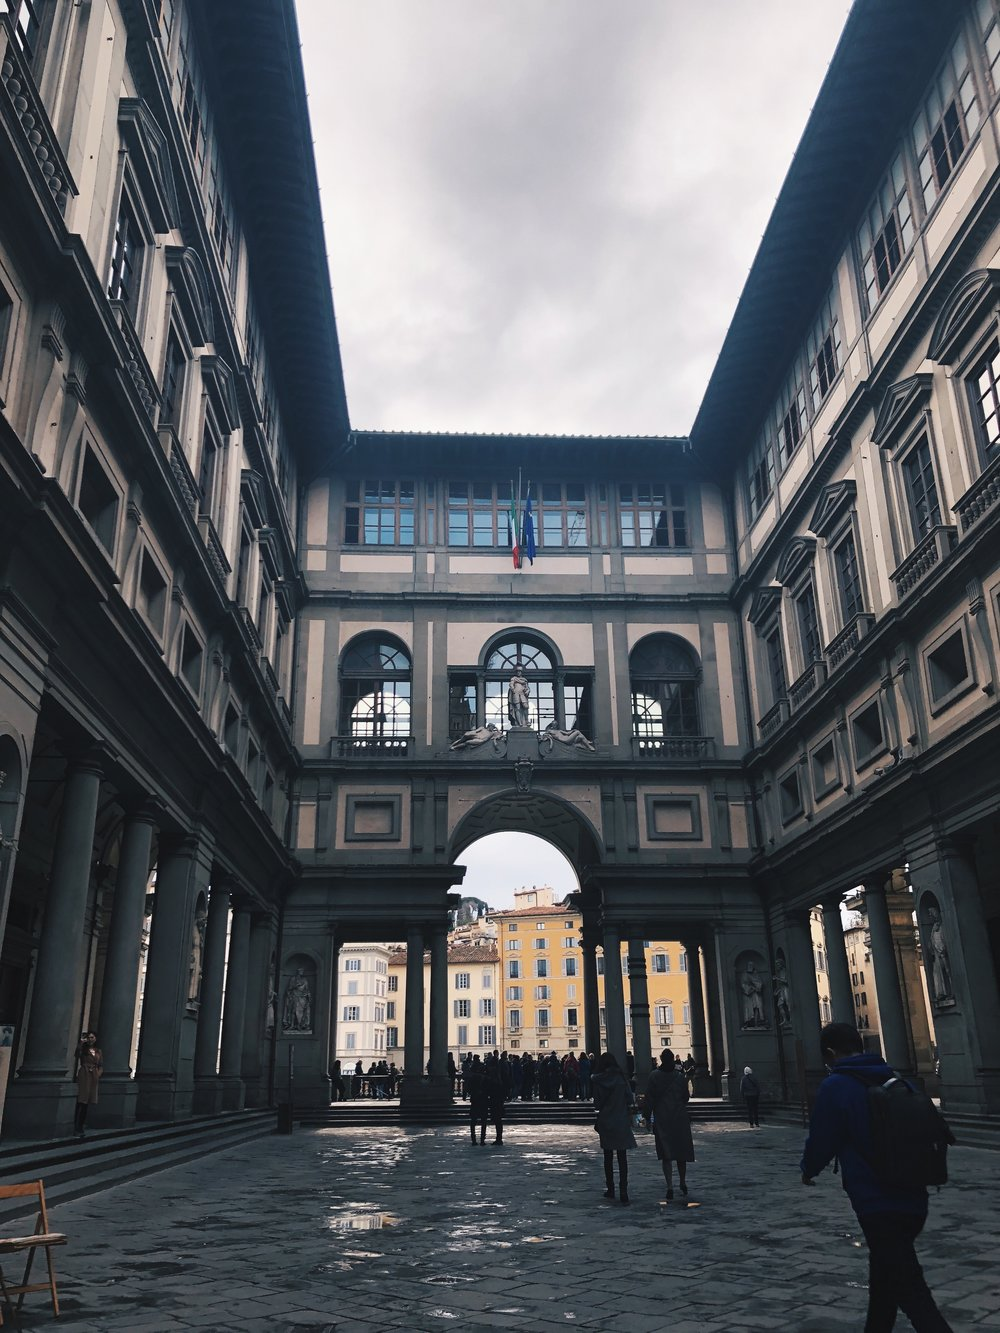 Ufizzi Gallery